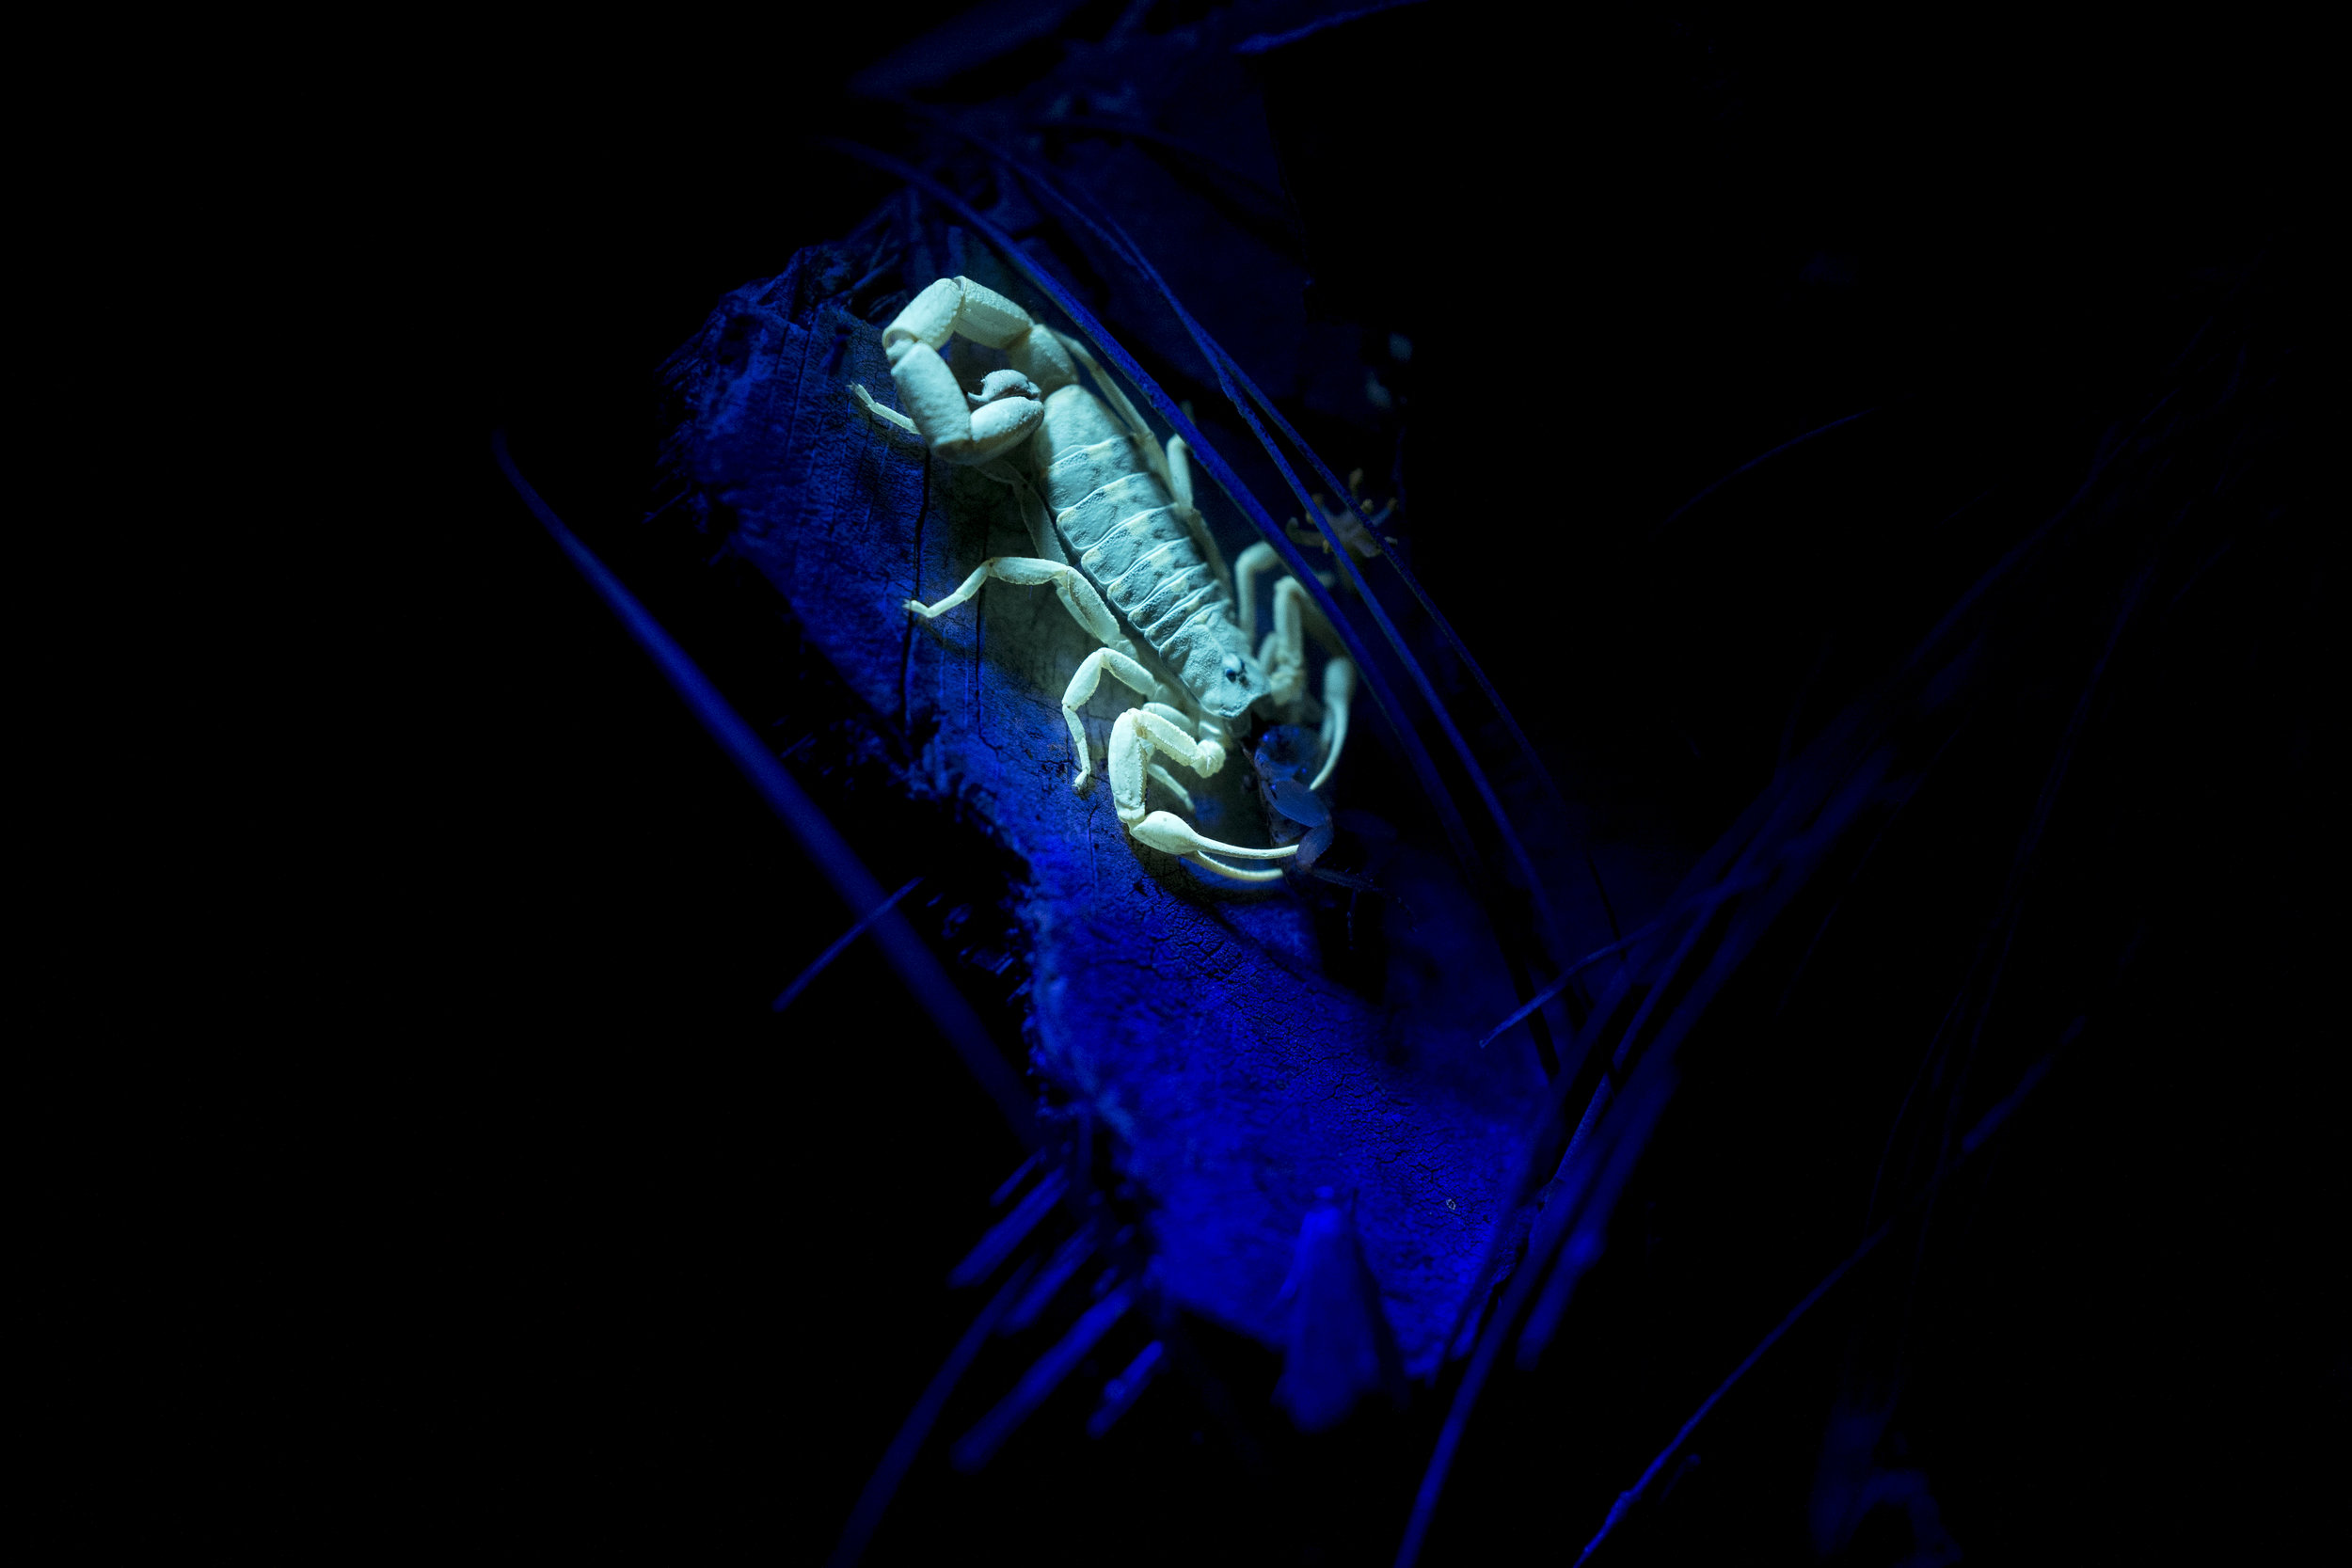 A scorpion lit by a uv flashlight